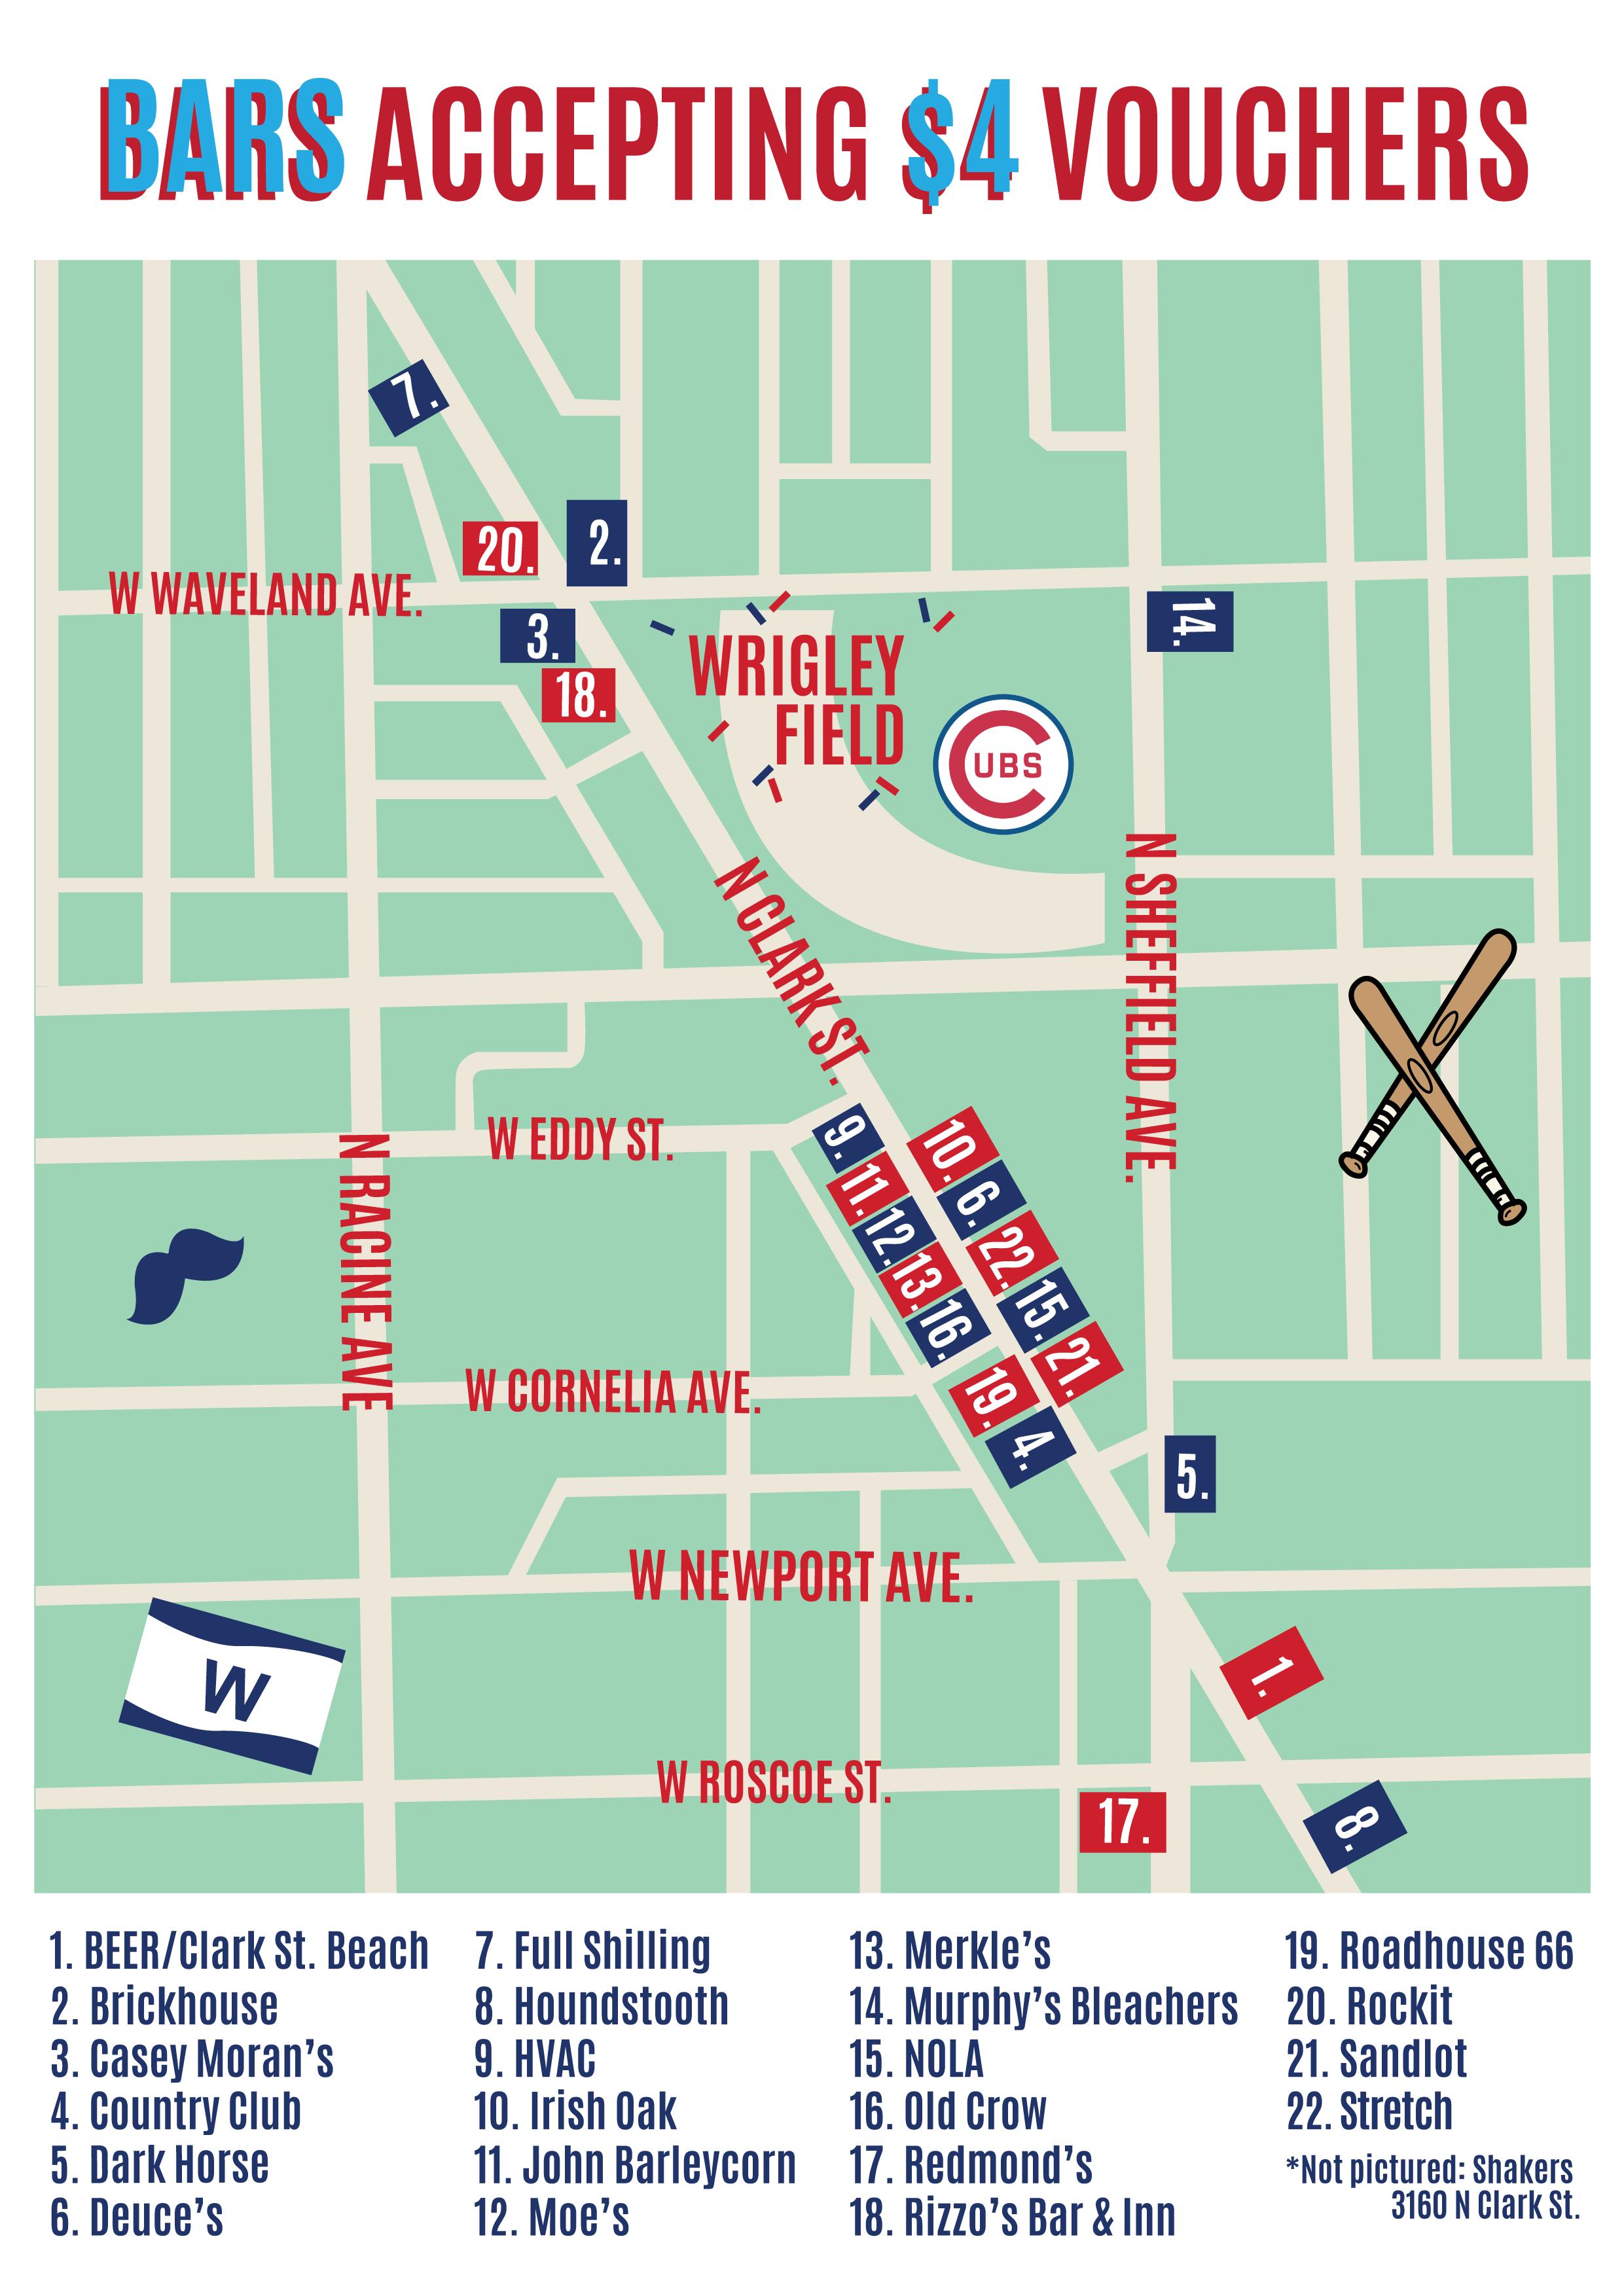 Mustache Crawl Bar Map - Bars Accepting $4 Vouchers